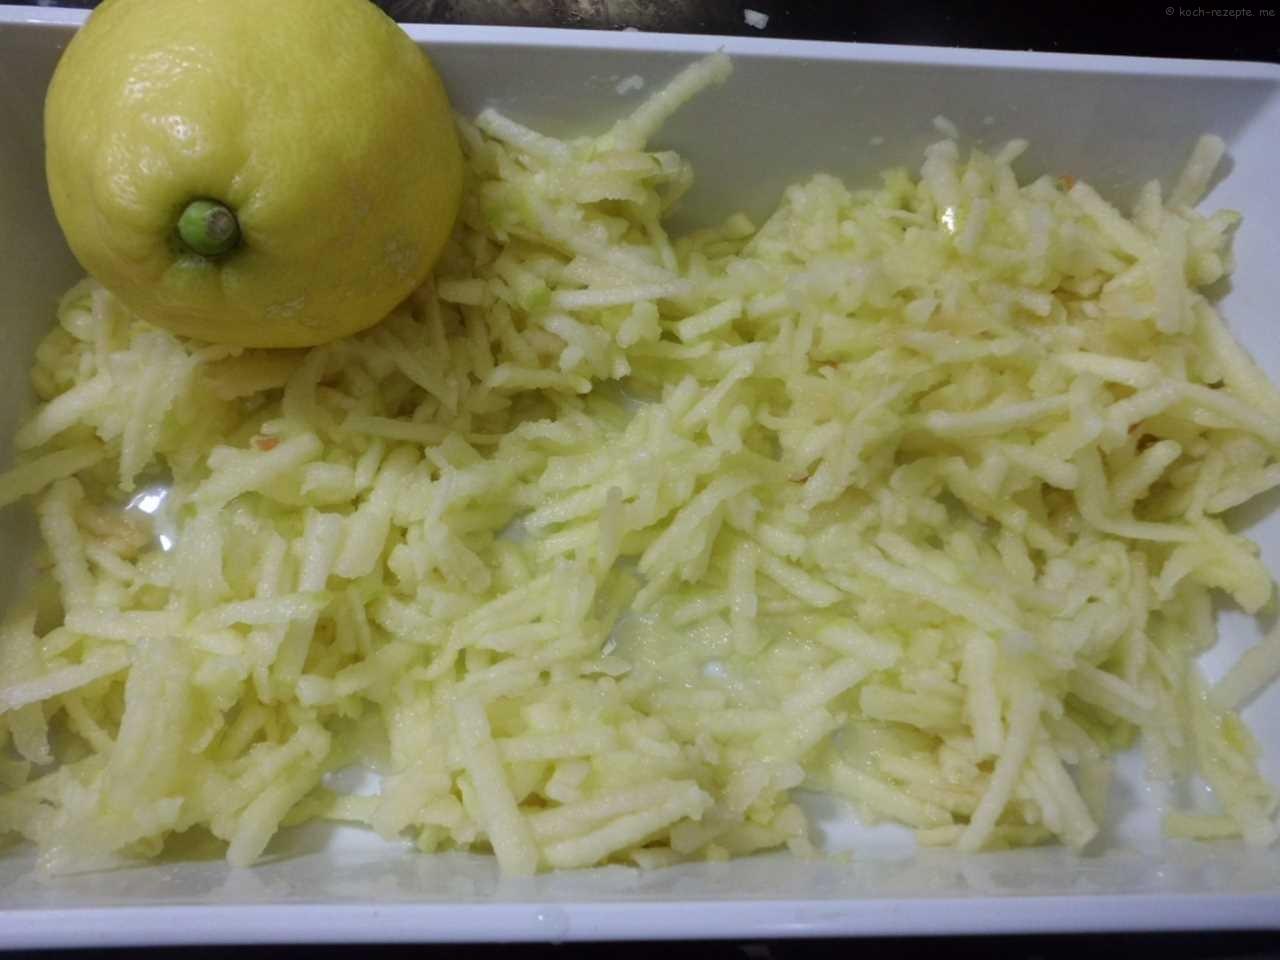 geraspelte Äpfel mit Zitronensaft